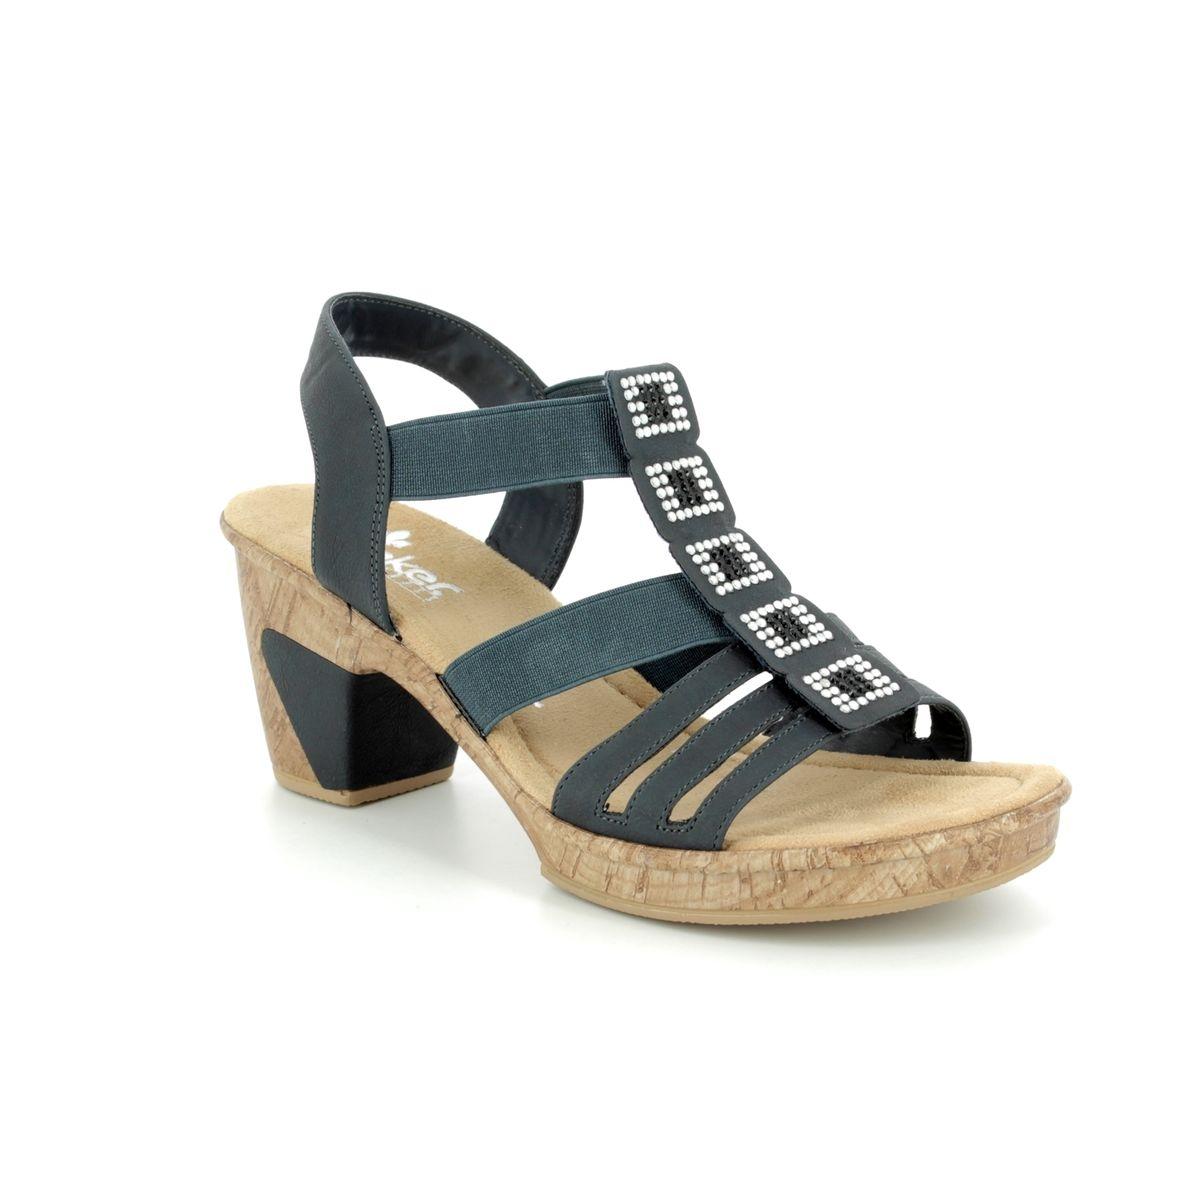 2e8f2eabad99d Rieker Heeled Sandals - Navy - 69761-14 ROBSQUARE